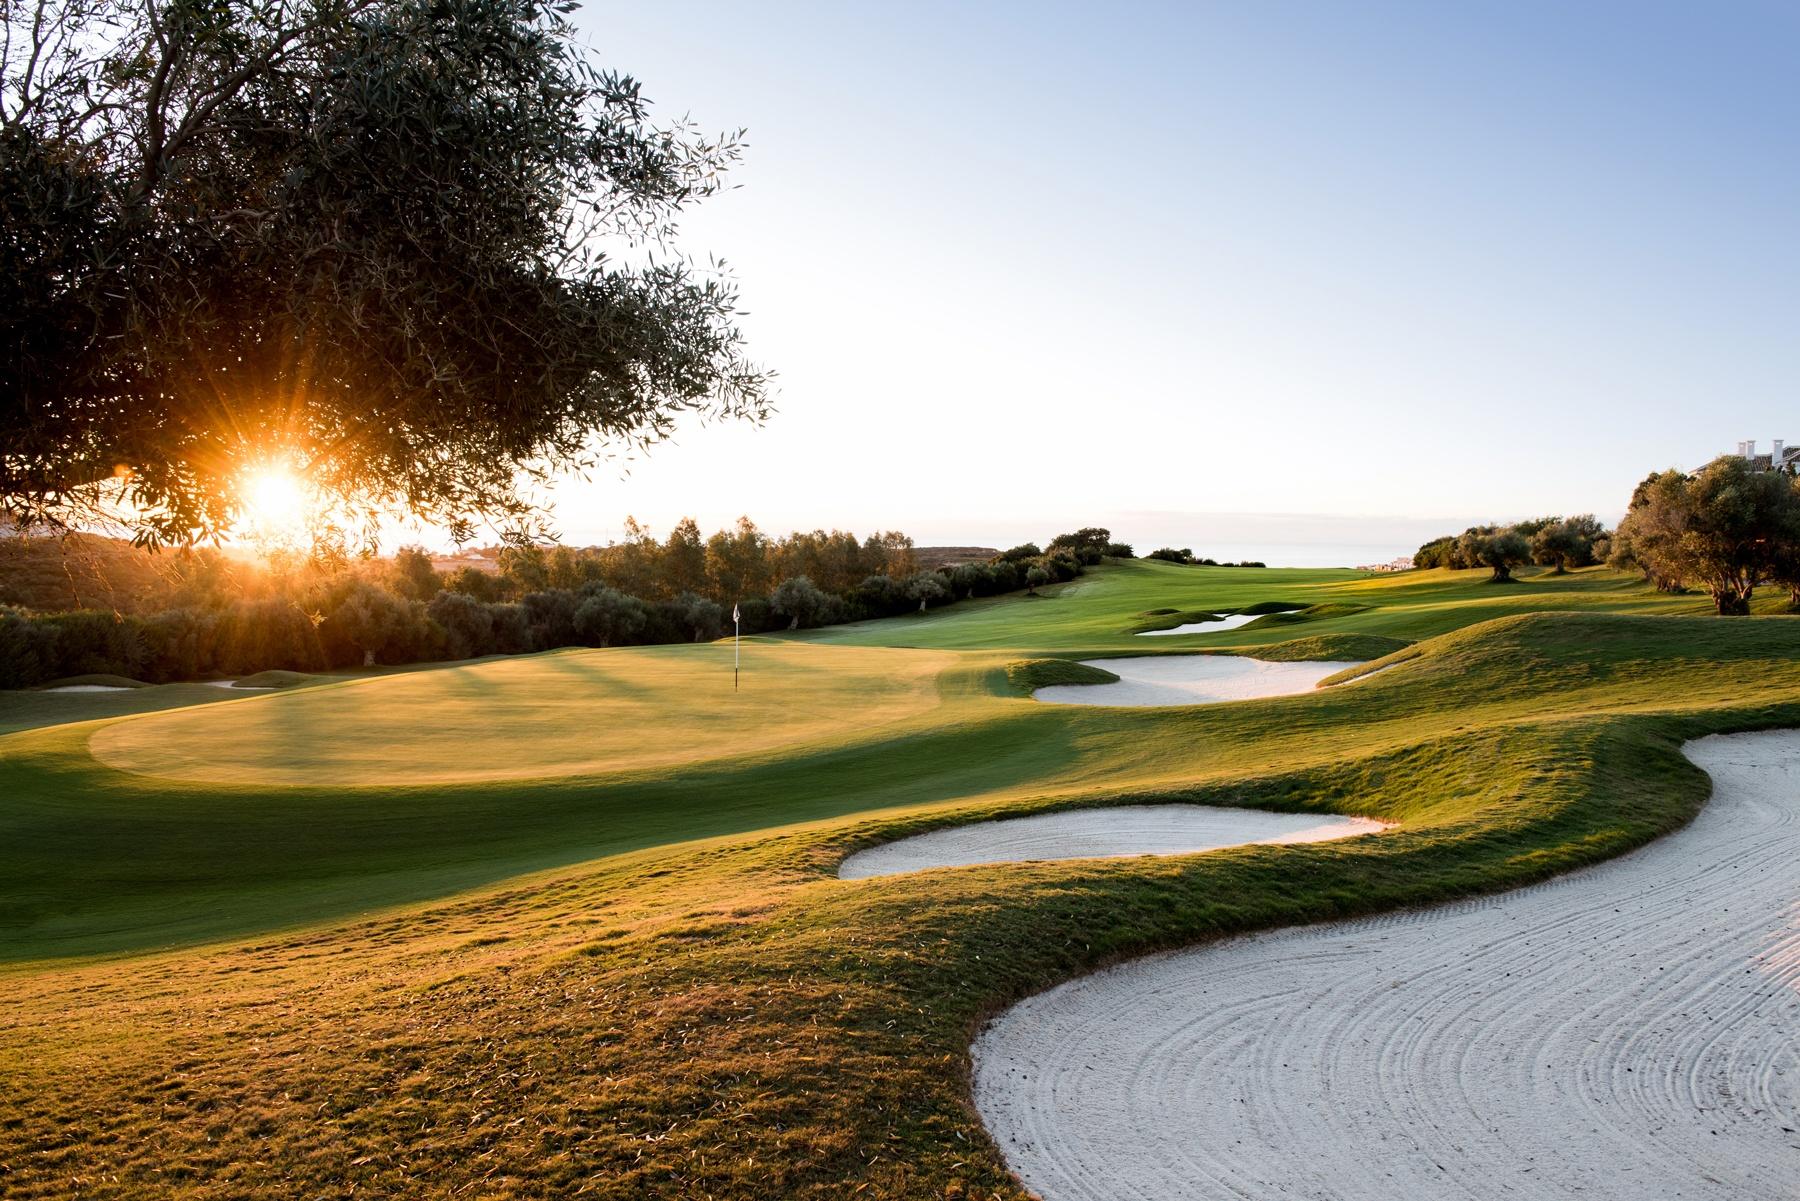 Finca Cortesin Golf Club, Costa del Sol